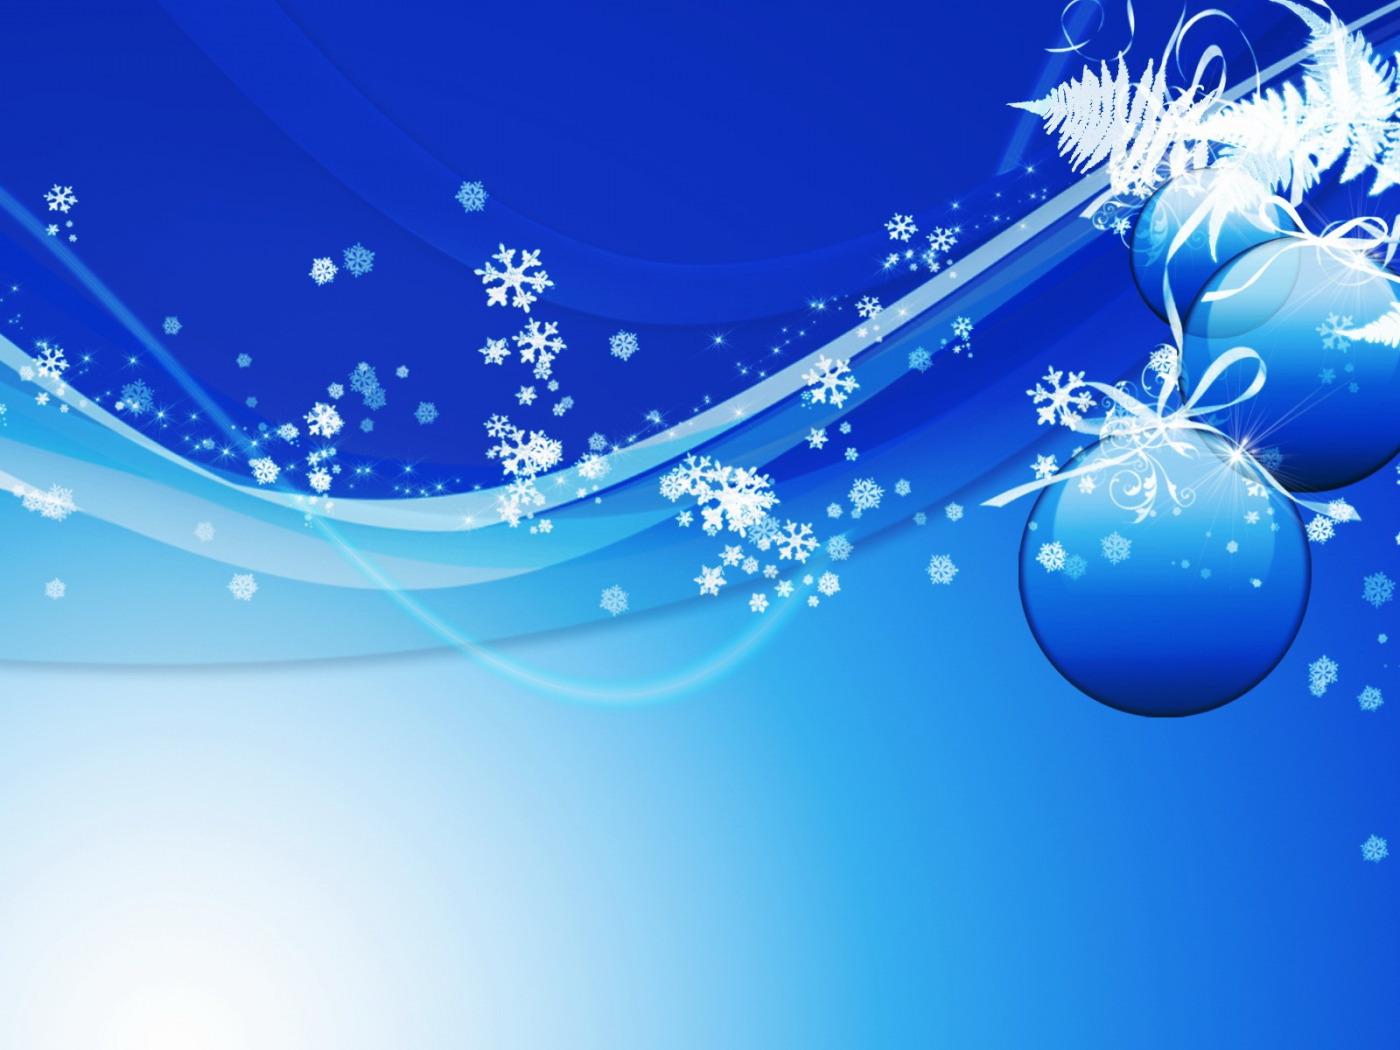 Картинка новогодний фон для открытки, яндекс почте